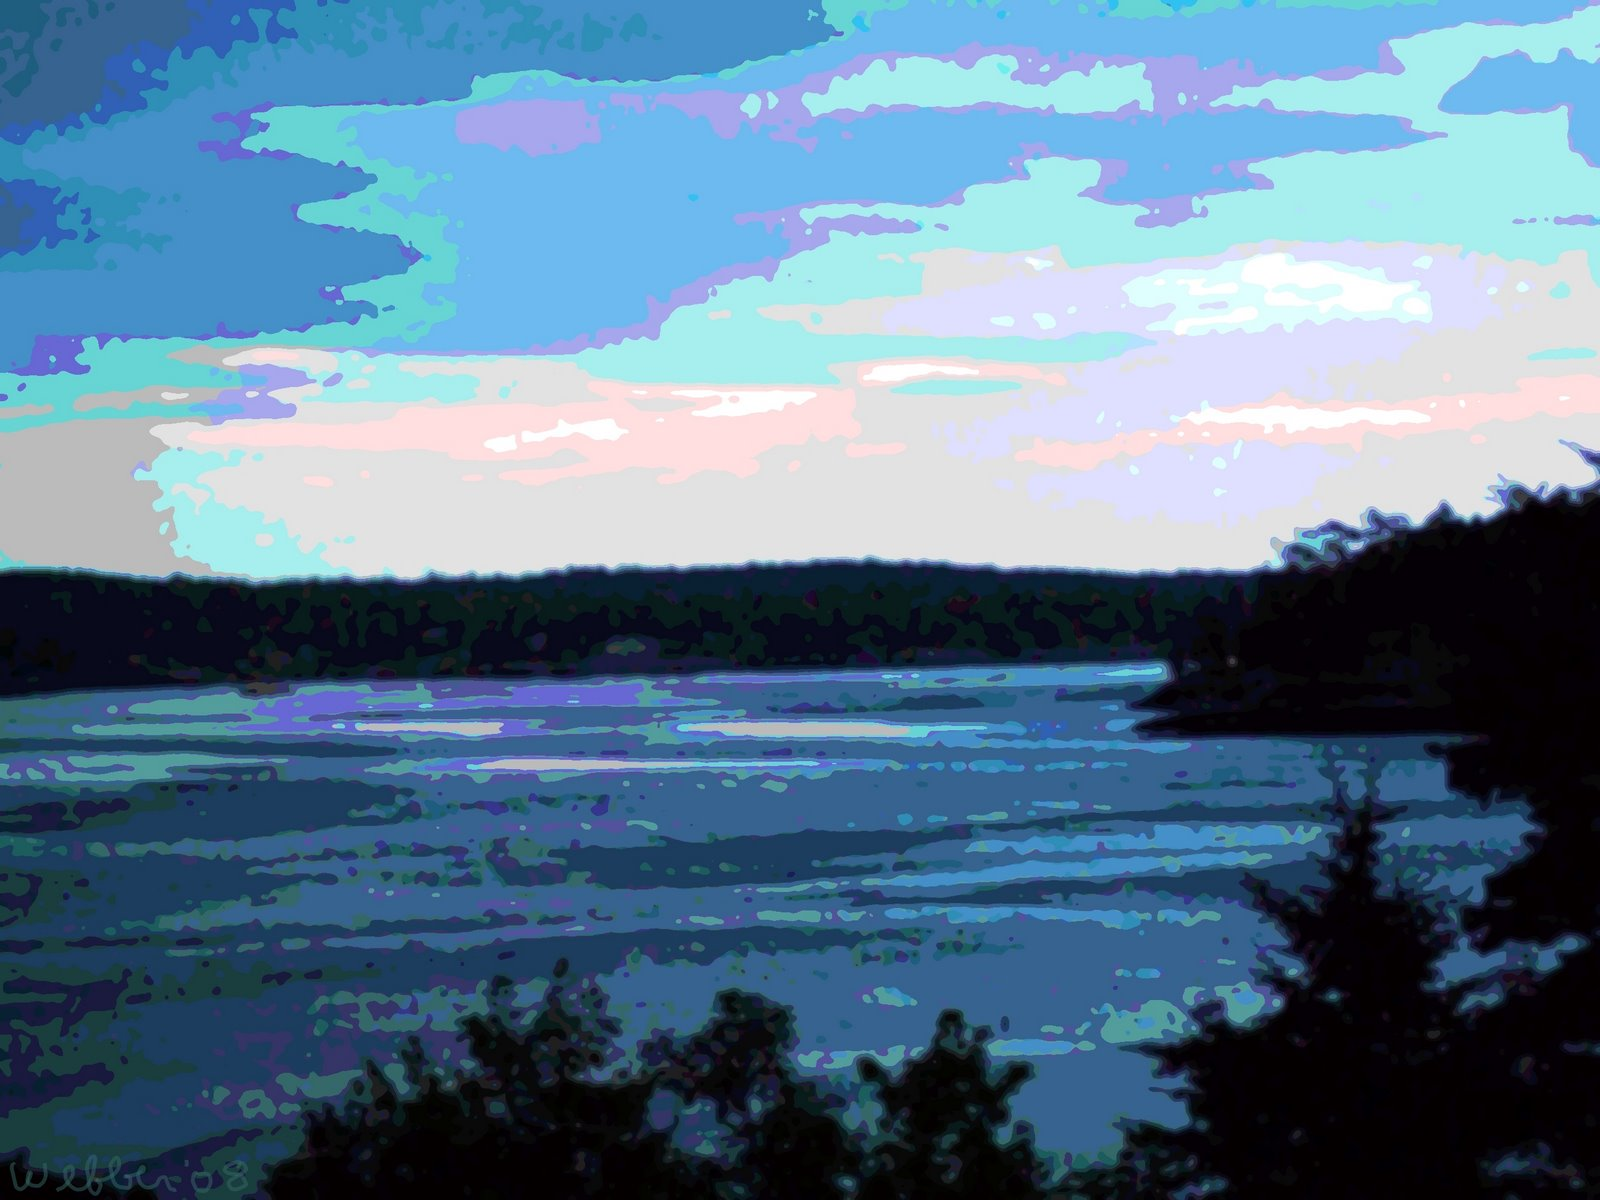 [WATER+AND+SKY.jpg]